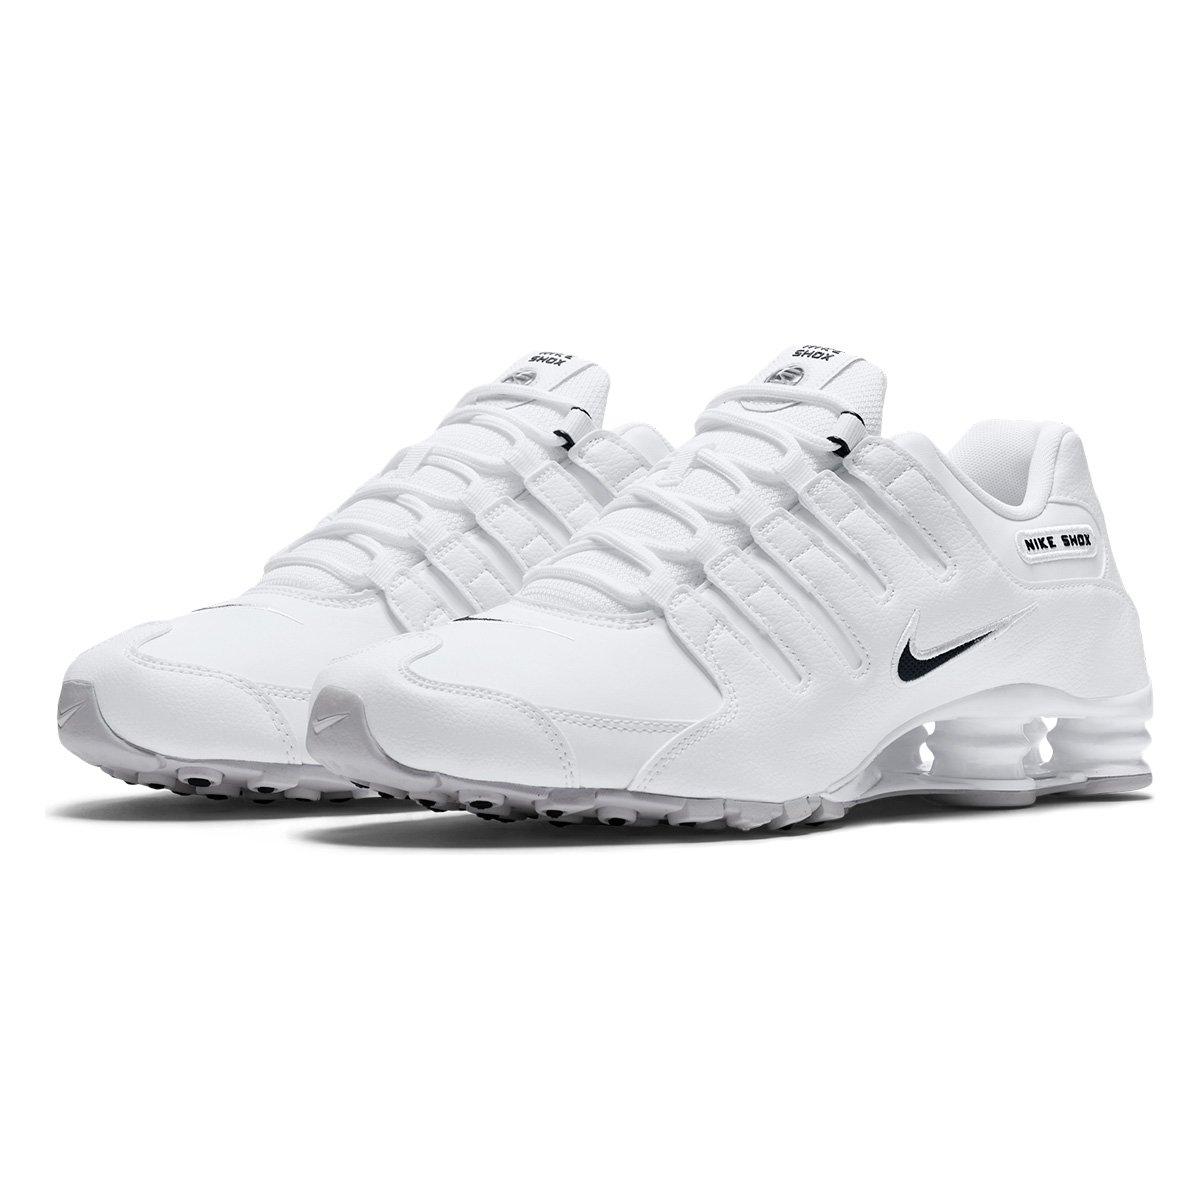 432c99d29fa Tênis Nike Shox Nz Eu Masculino - Branco - Compre Agora